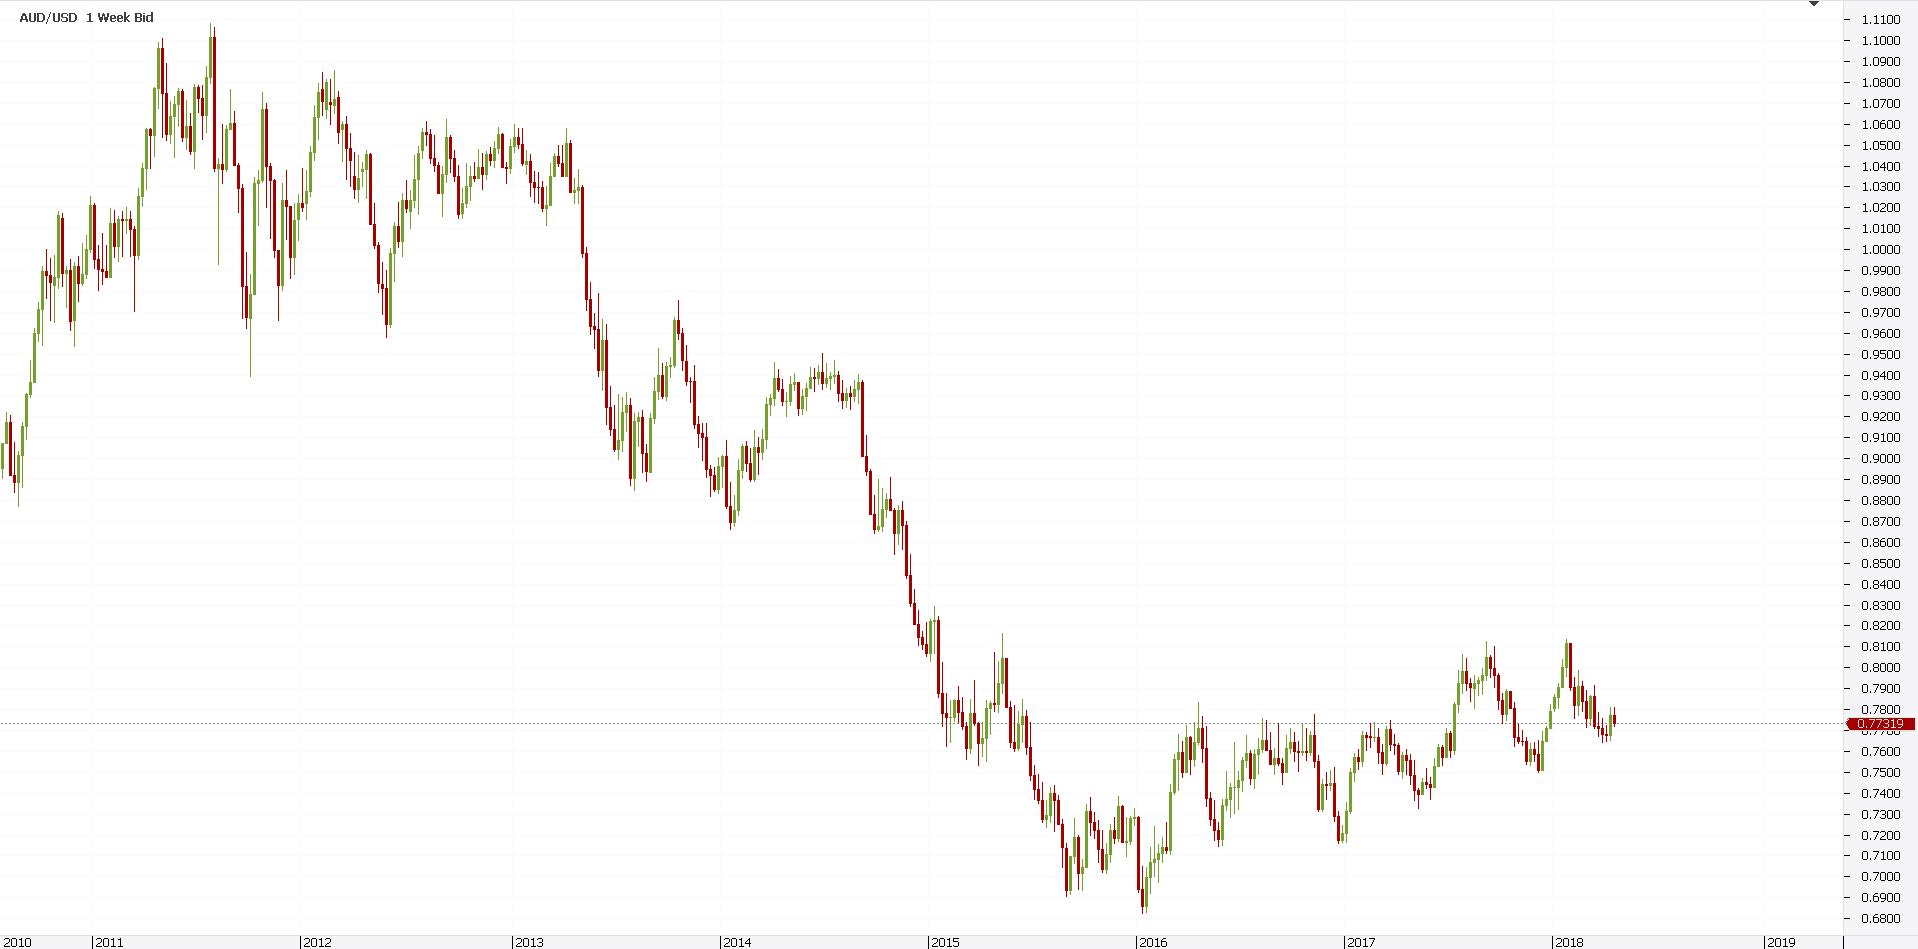 Trend Reversal